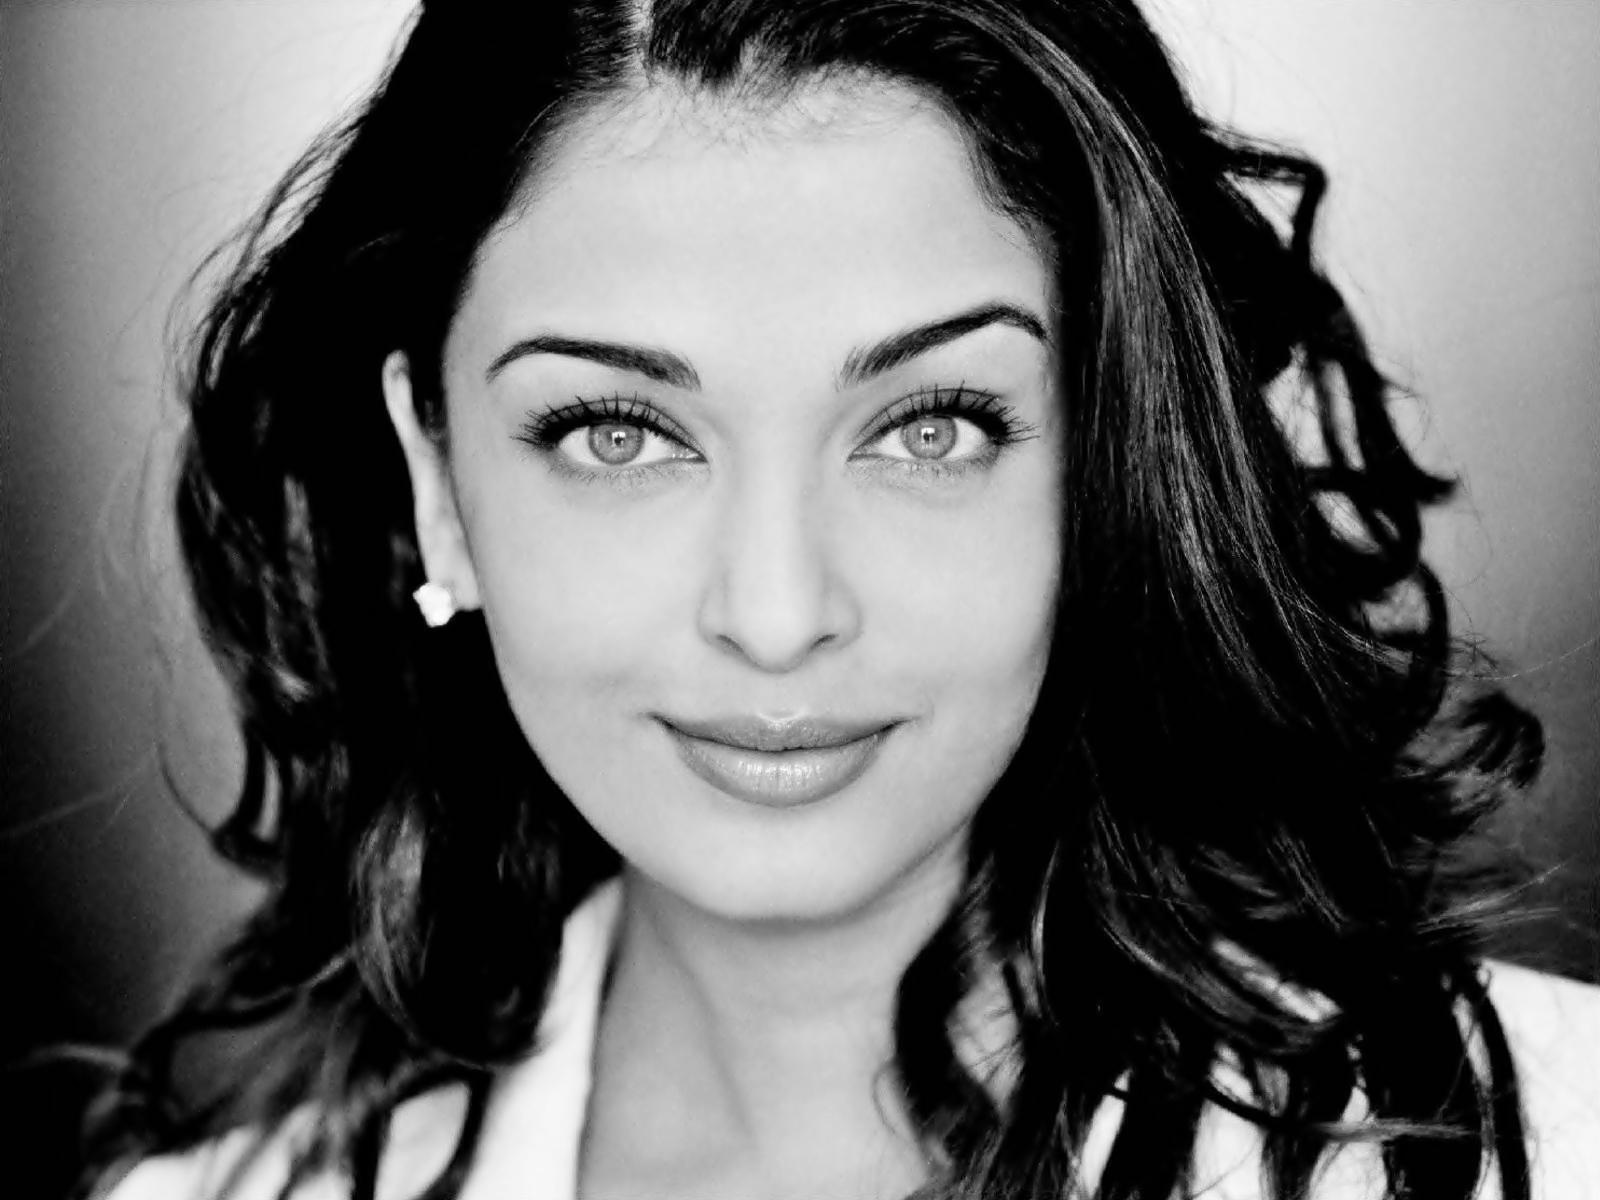 bollywood actress images aishwarya rai hd wallpaper and background